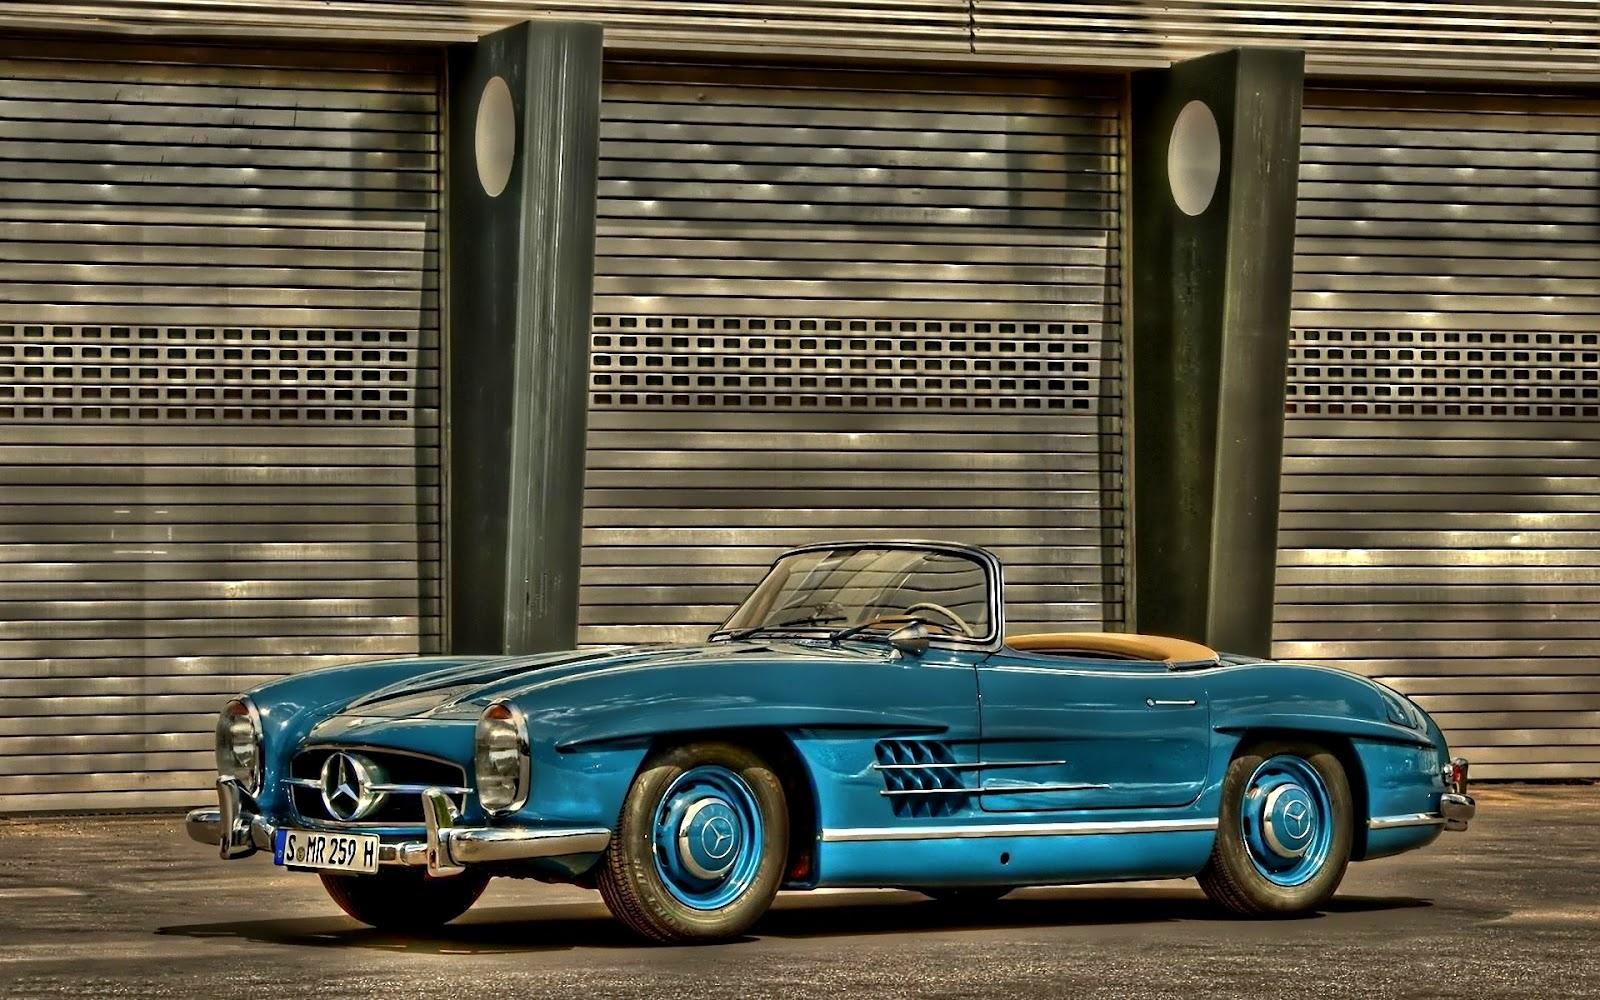 50 Benz Cars Wallpapers Hd Top Cars Wallpaper Hd